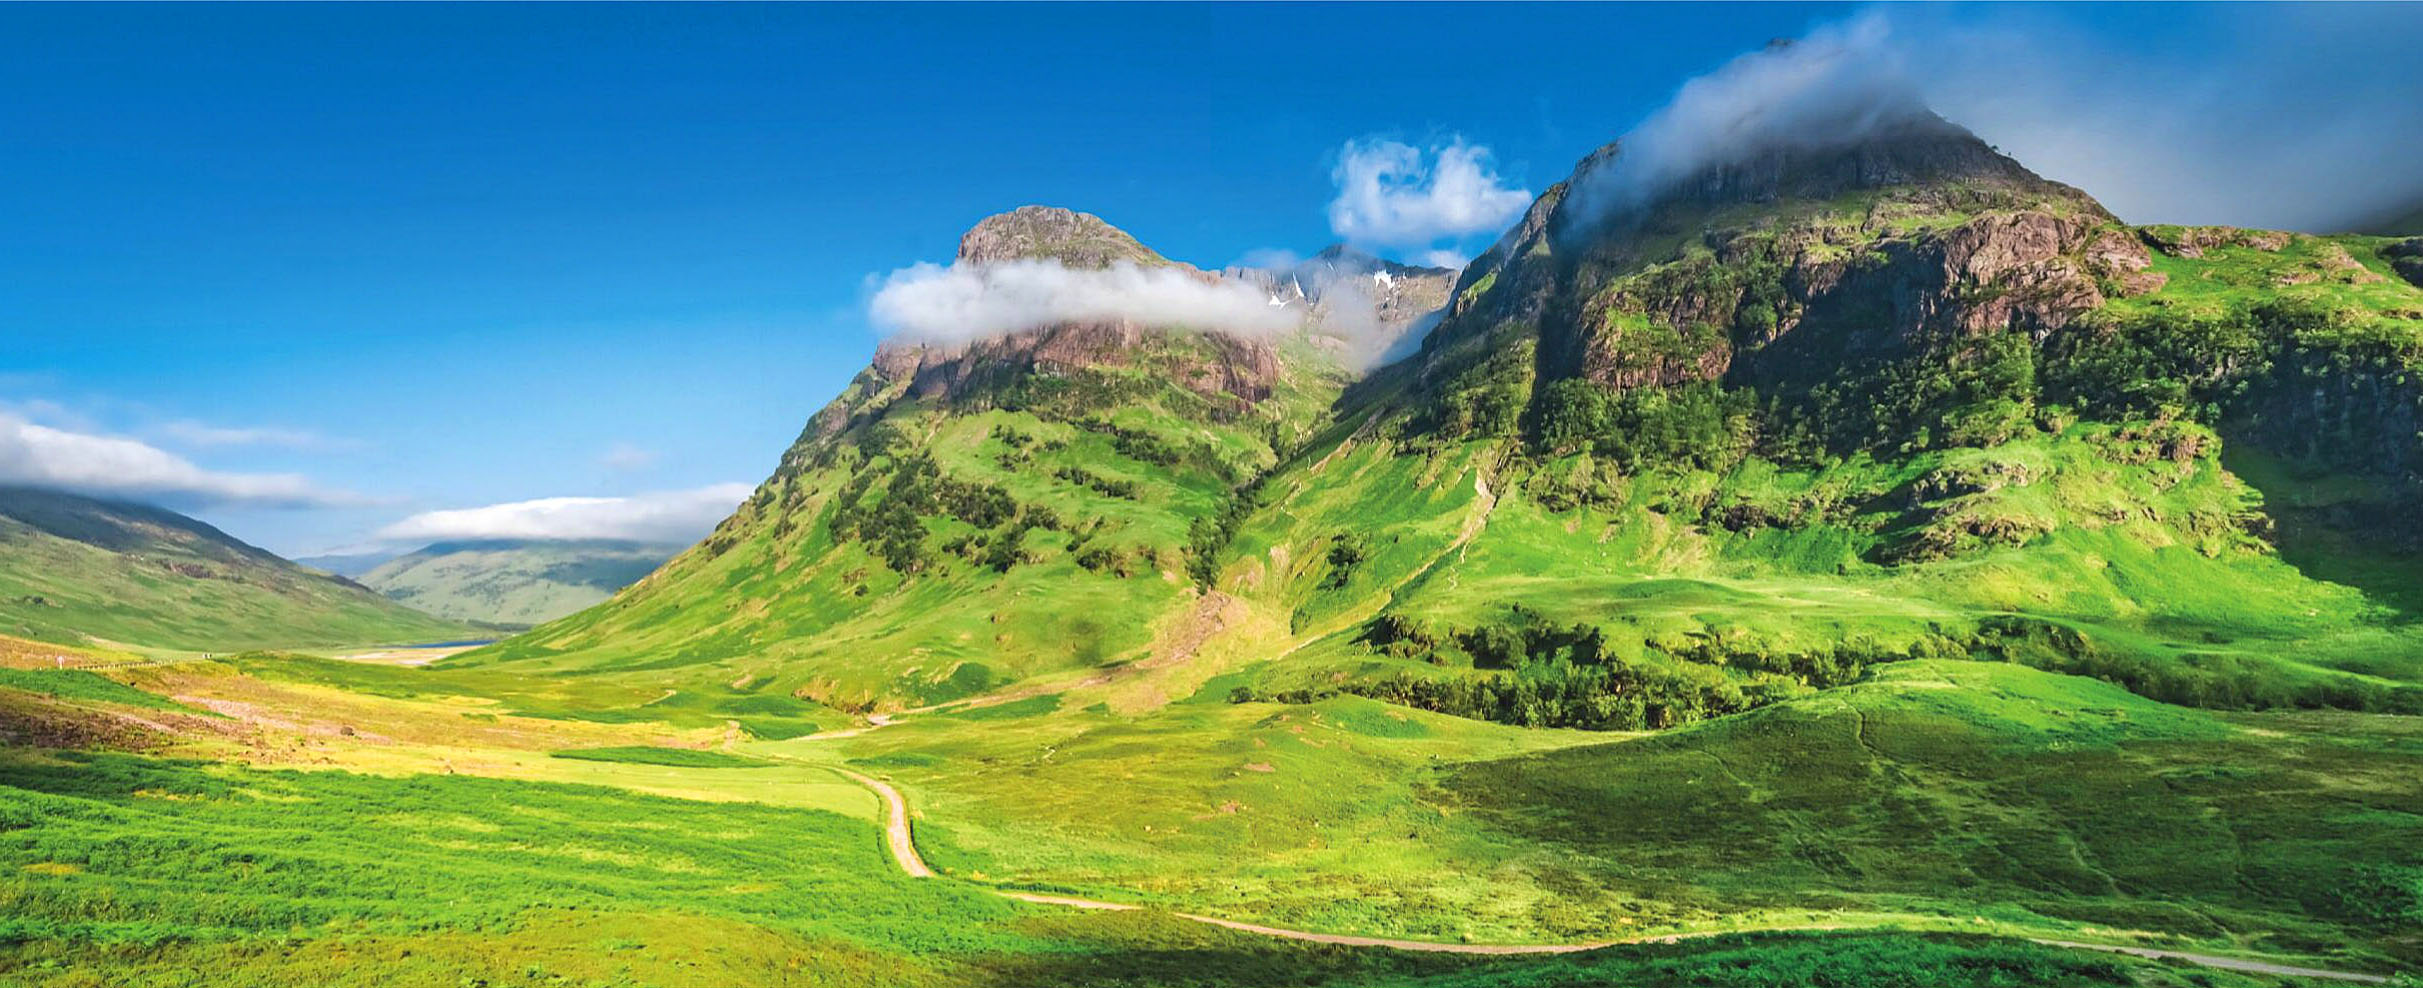 Glencoe Valley, Scotland by Shaiith.jpg